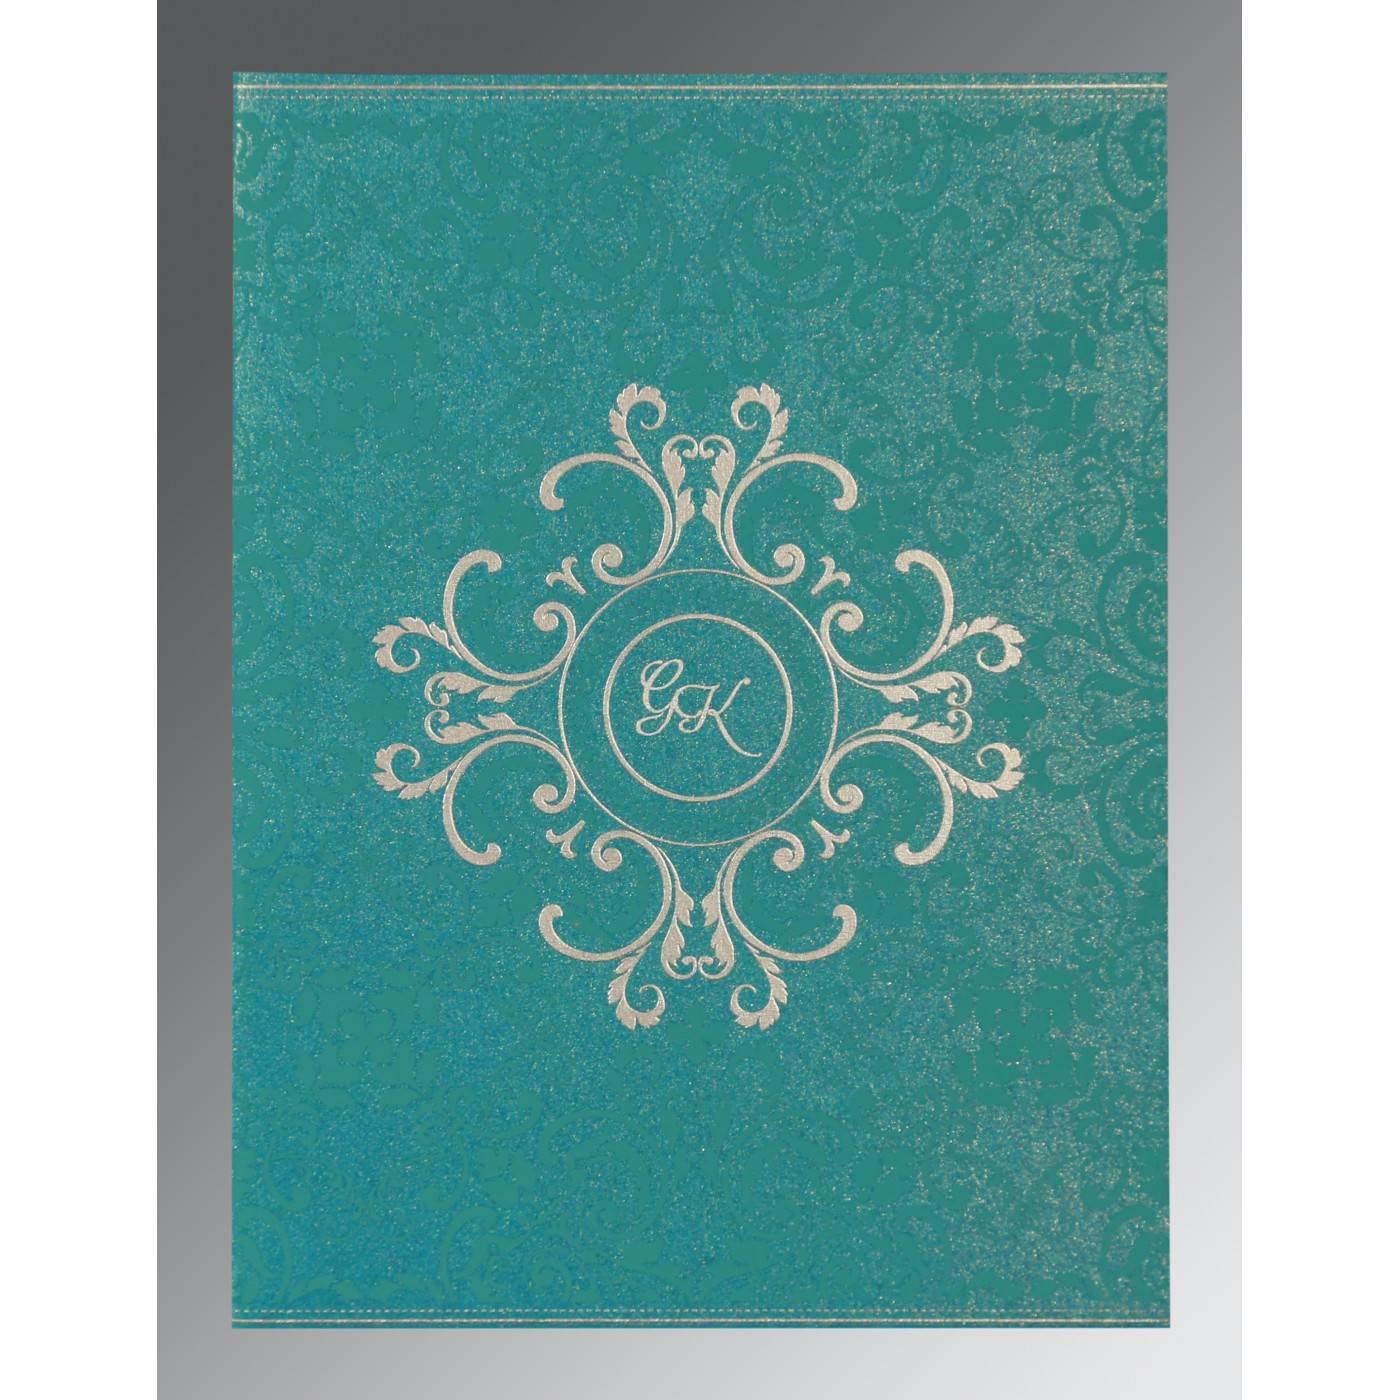 TEAL BLUE SHIMMERY SCREEN PRINTED WEDDING CARD : CI-8244C - IndianWeddingCards